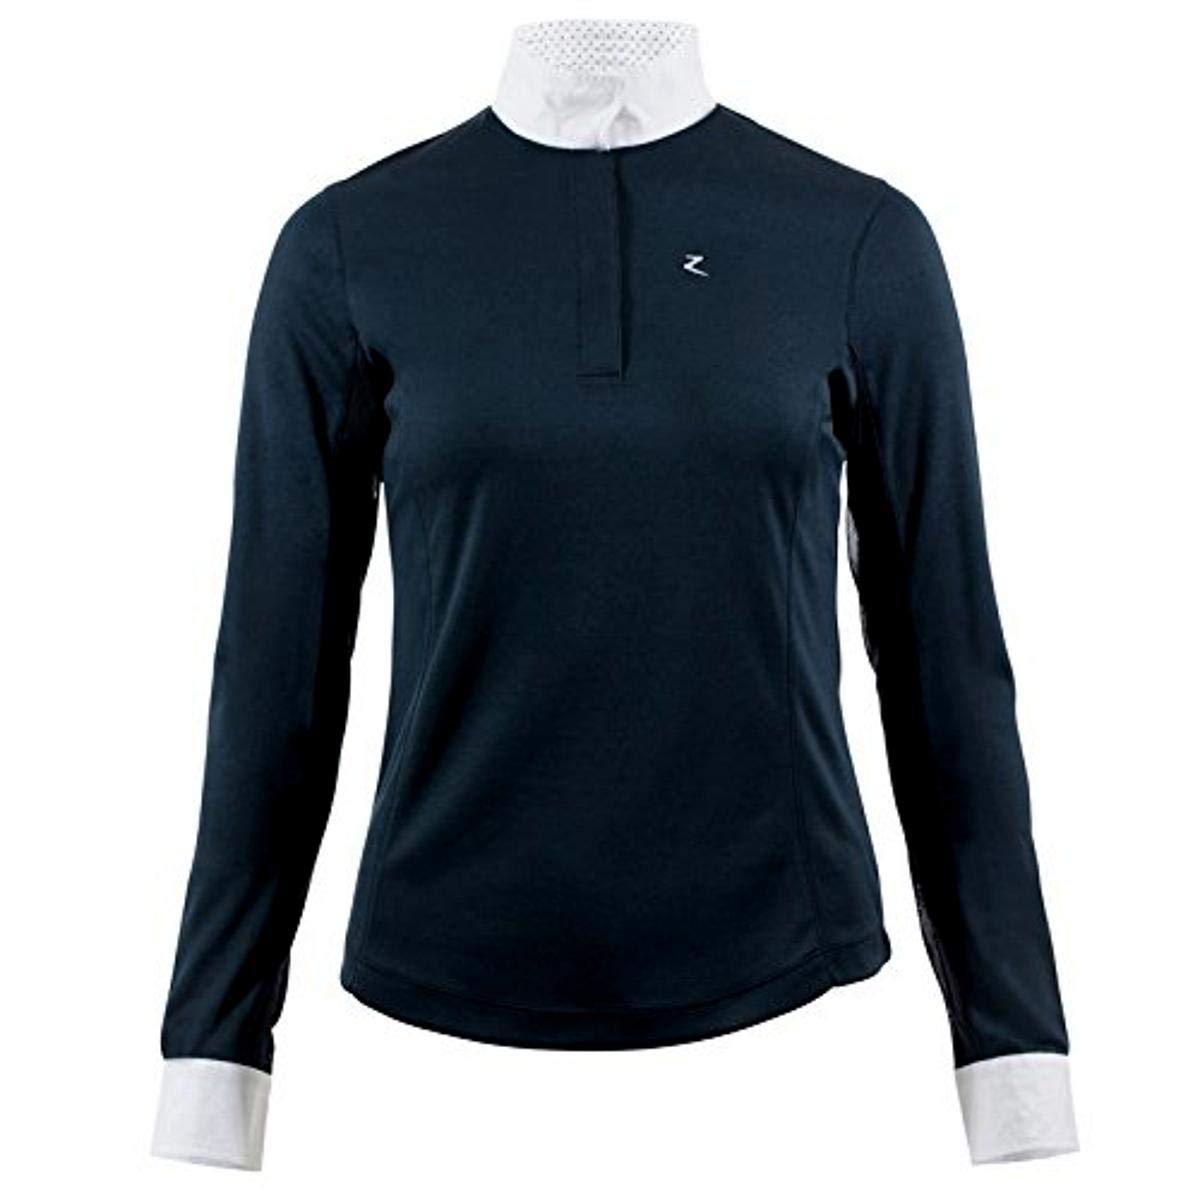 Horze Blaire Ladies UV Ice Fit Long Sleeve Show Shirt